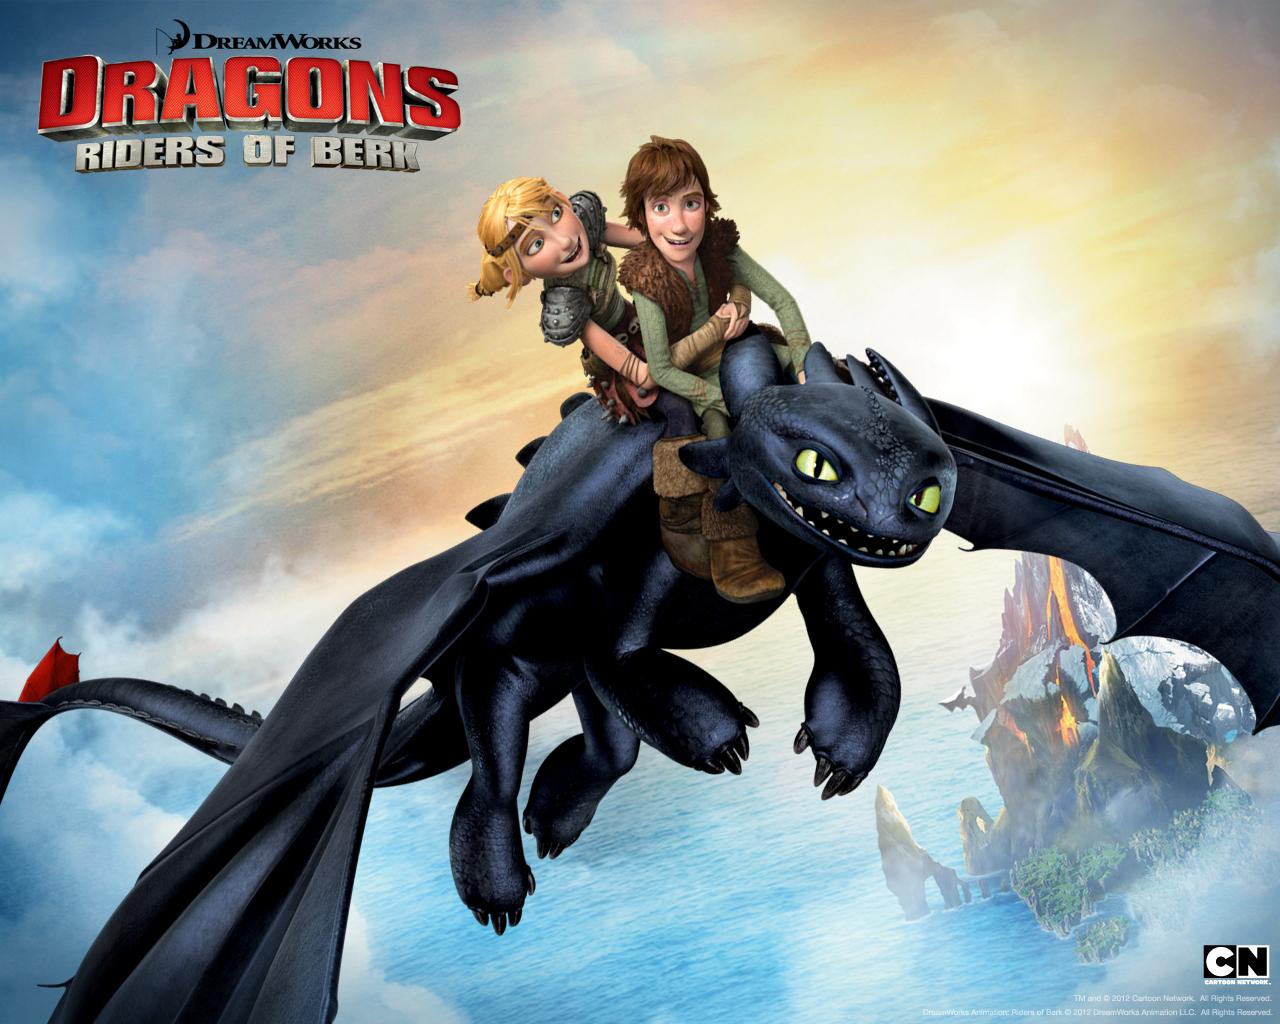 Cielos Salvajes Cielos Salvajes Cielos Salvajes De Dragones Cartoon